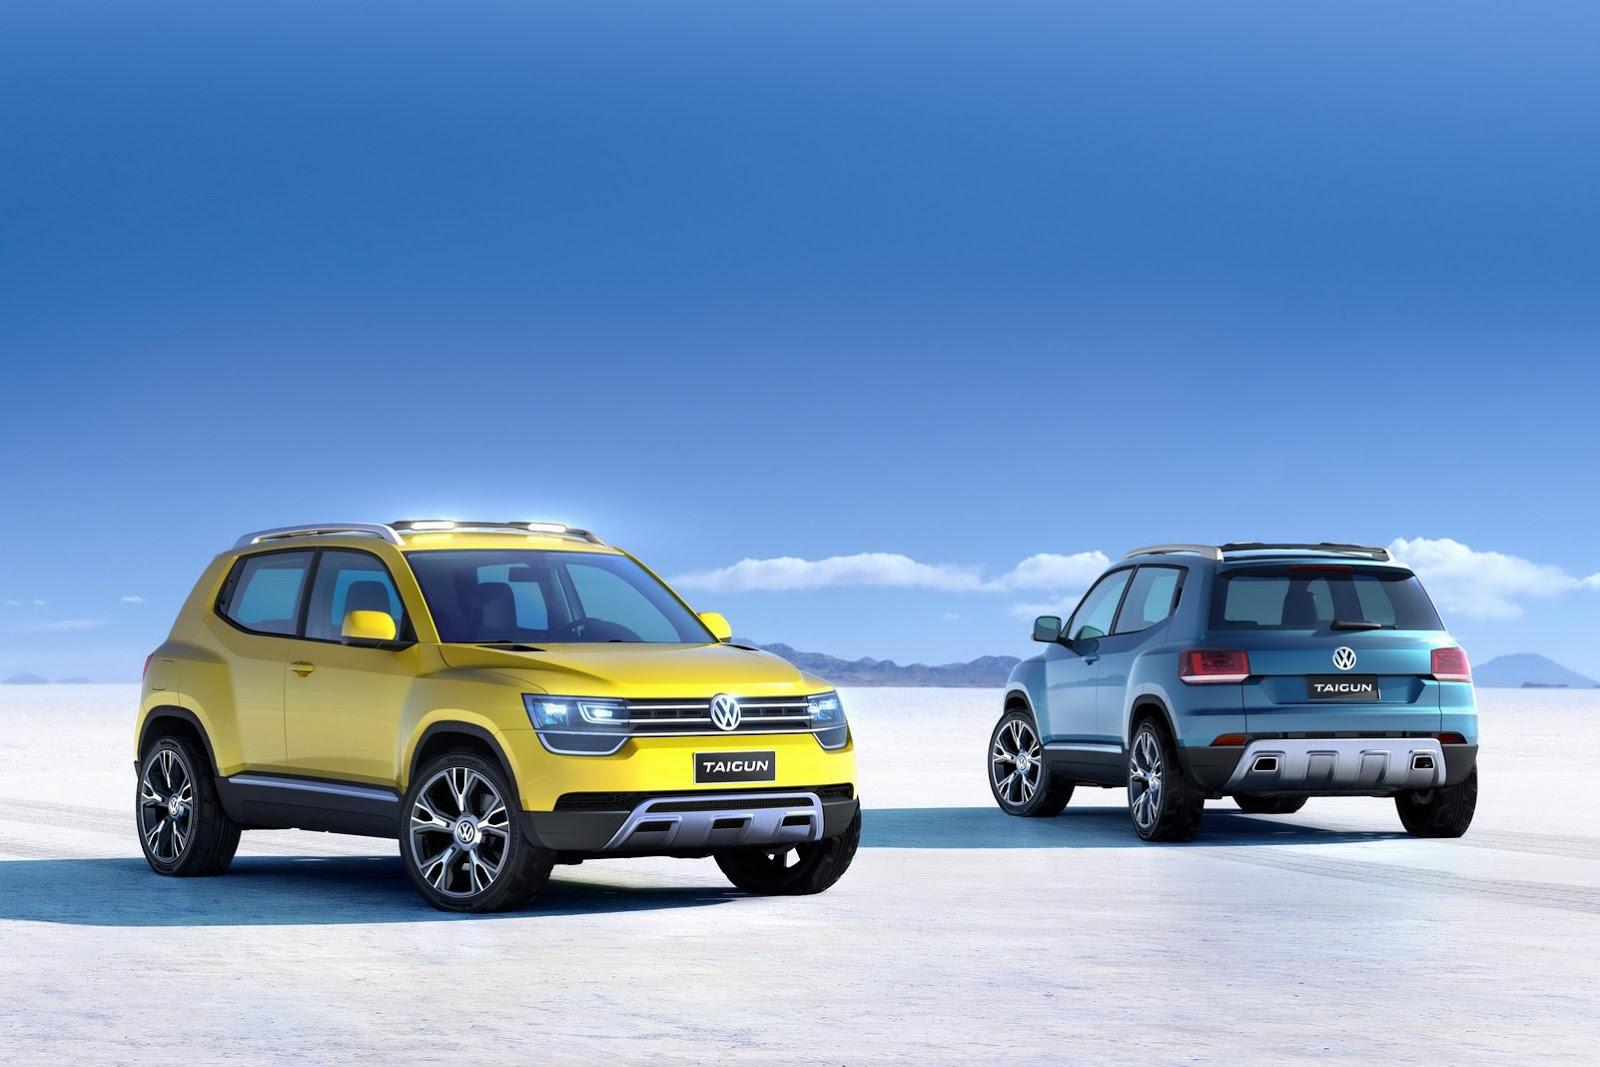 http://1.bp.blogspot.com/-cAPF2NMv1p8/UIYWRkkS7nI/AAAAAAAAmJU/Lxcp8I9dpJA/s1600/2012-Volkswagen-Taigun+-Concept-car-wallpaper-2.jpg